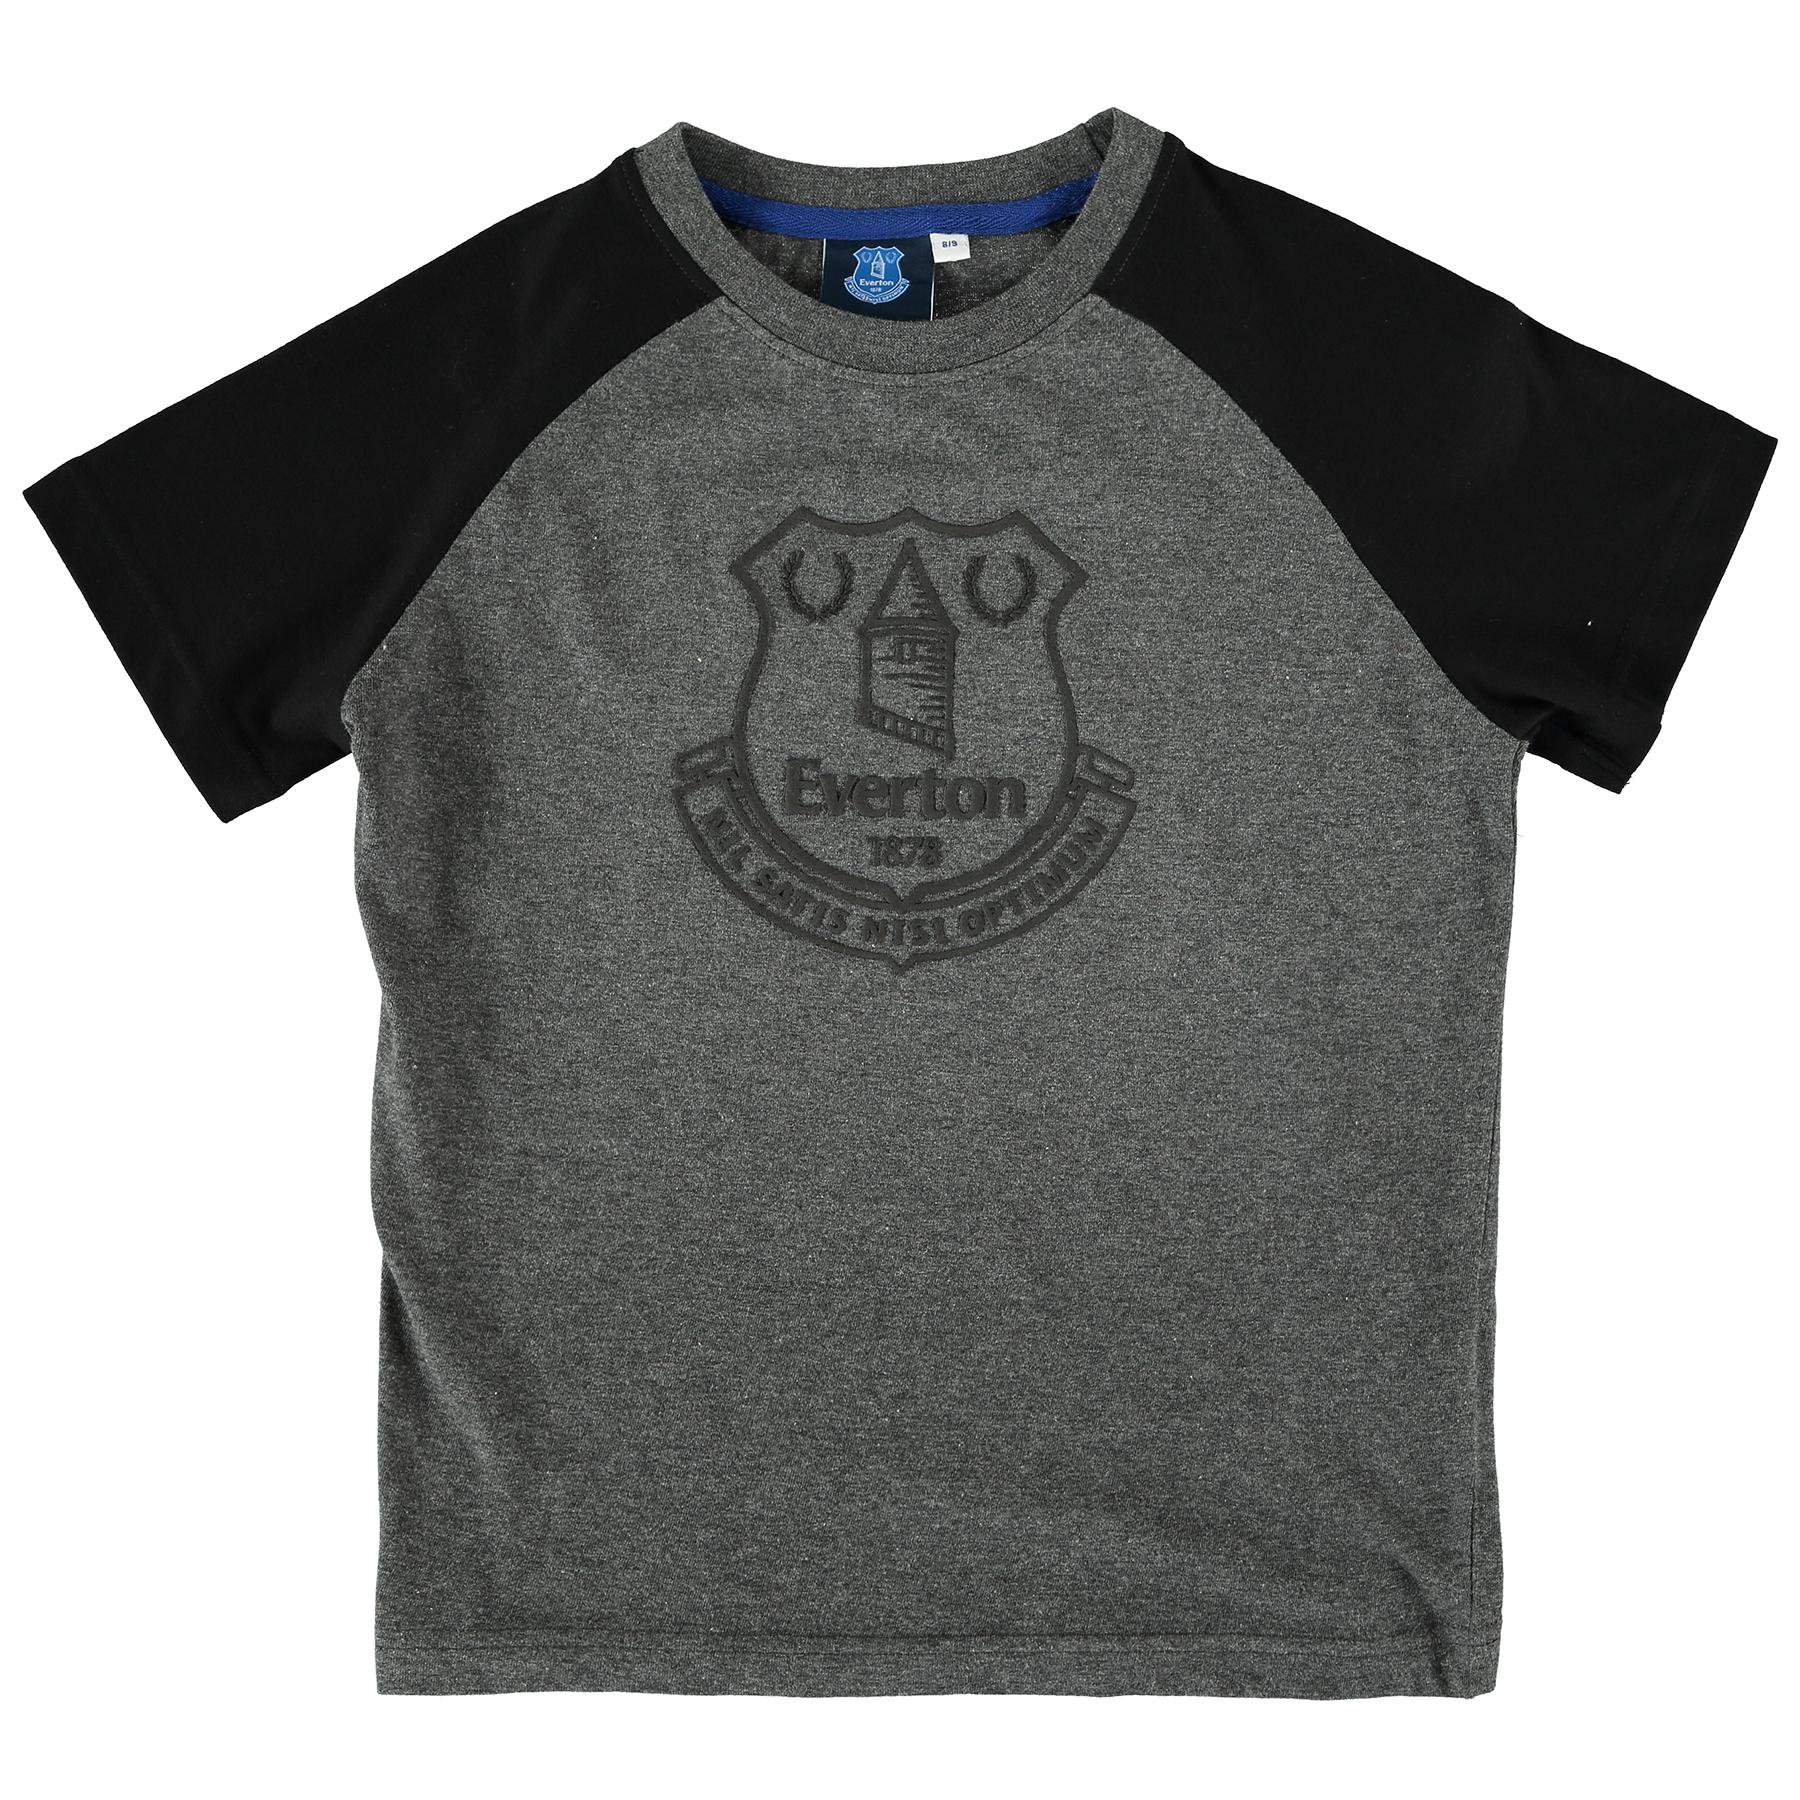 Everton Essentials Raglan T-Shirt - Grey Marl/Black - Junior